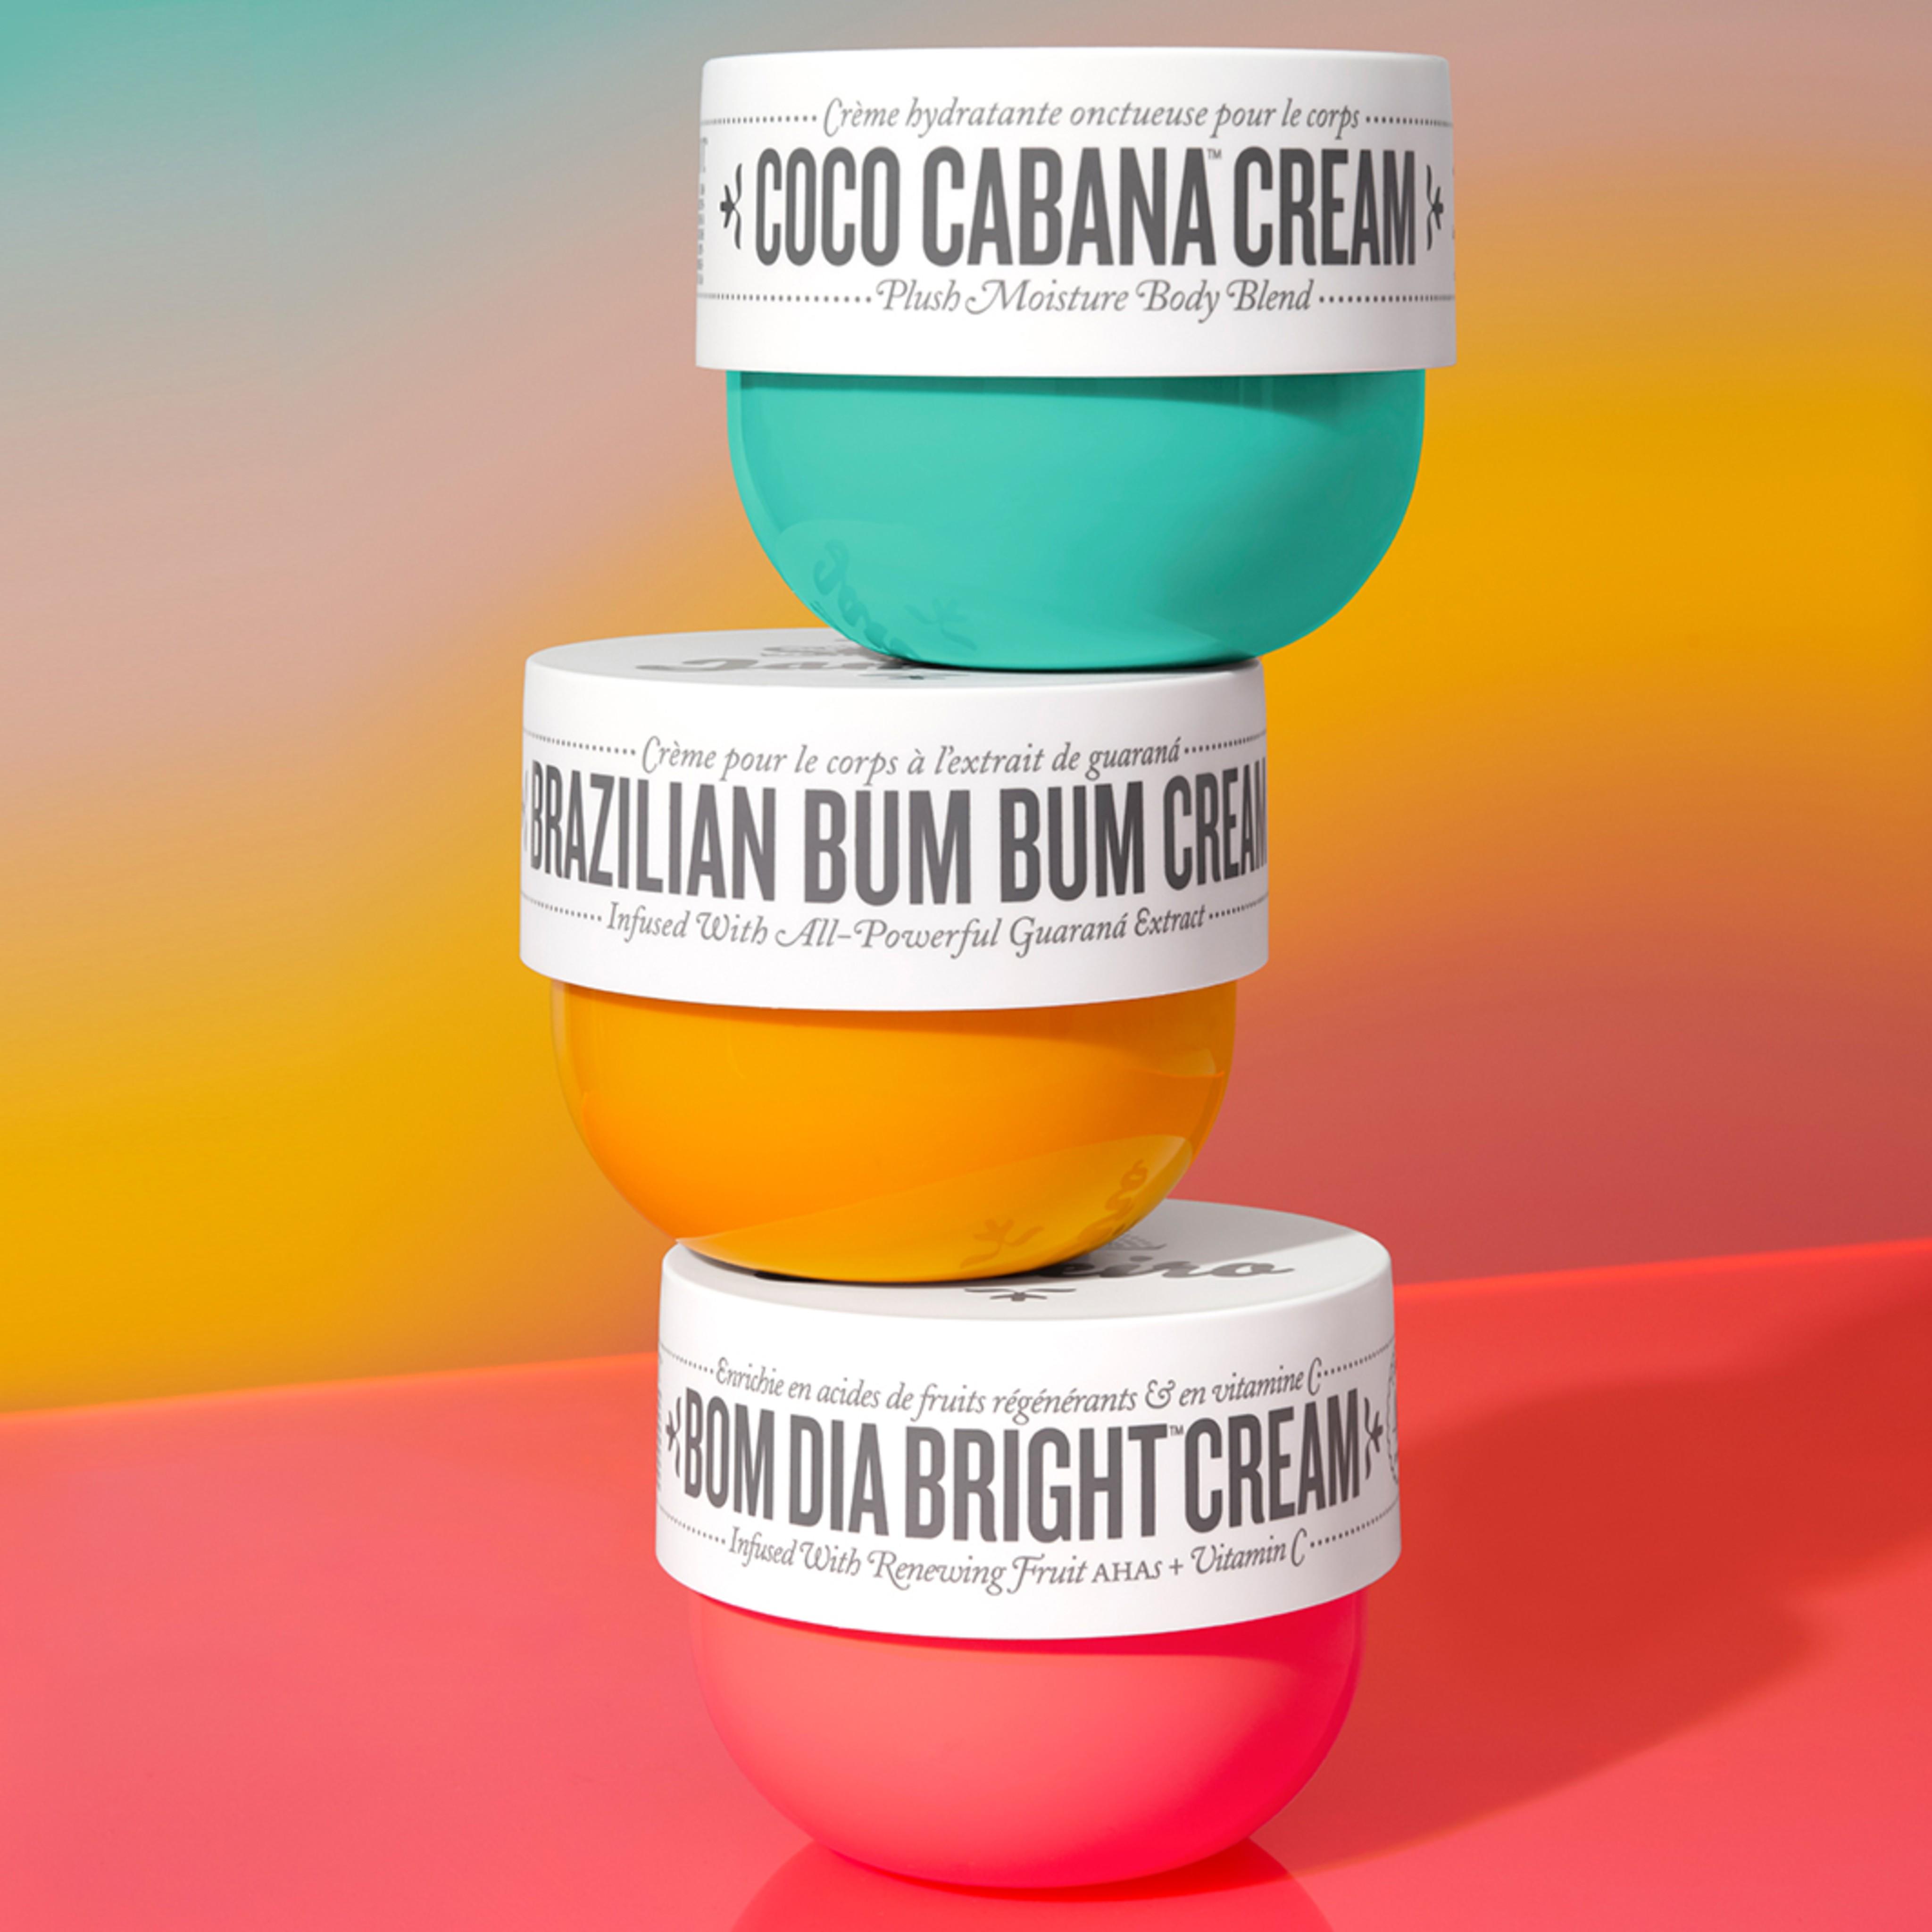 Crosscategory-product-sol-de-janeiro-groupshot-cream-trio-0423-Web-Rendition